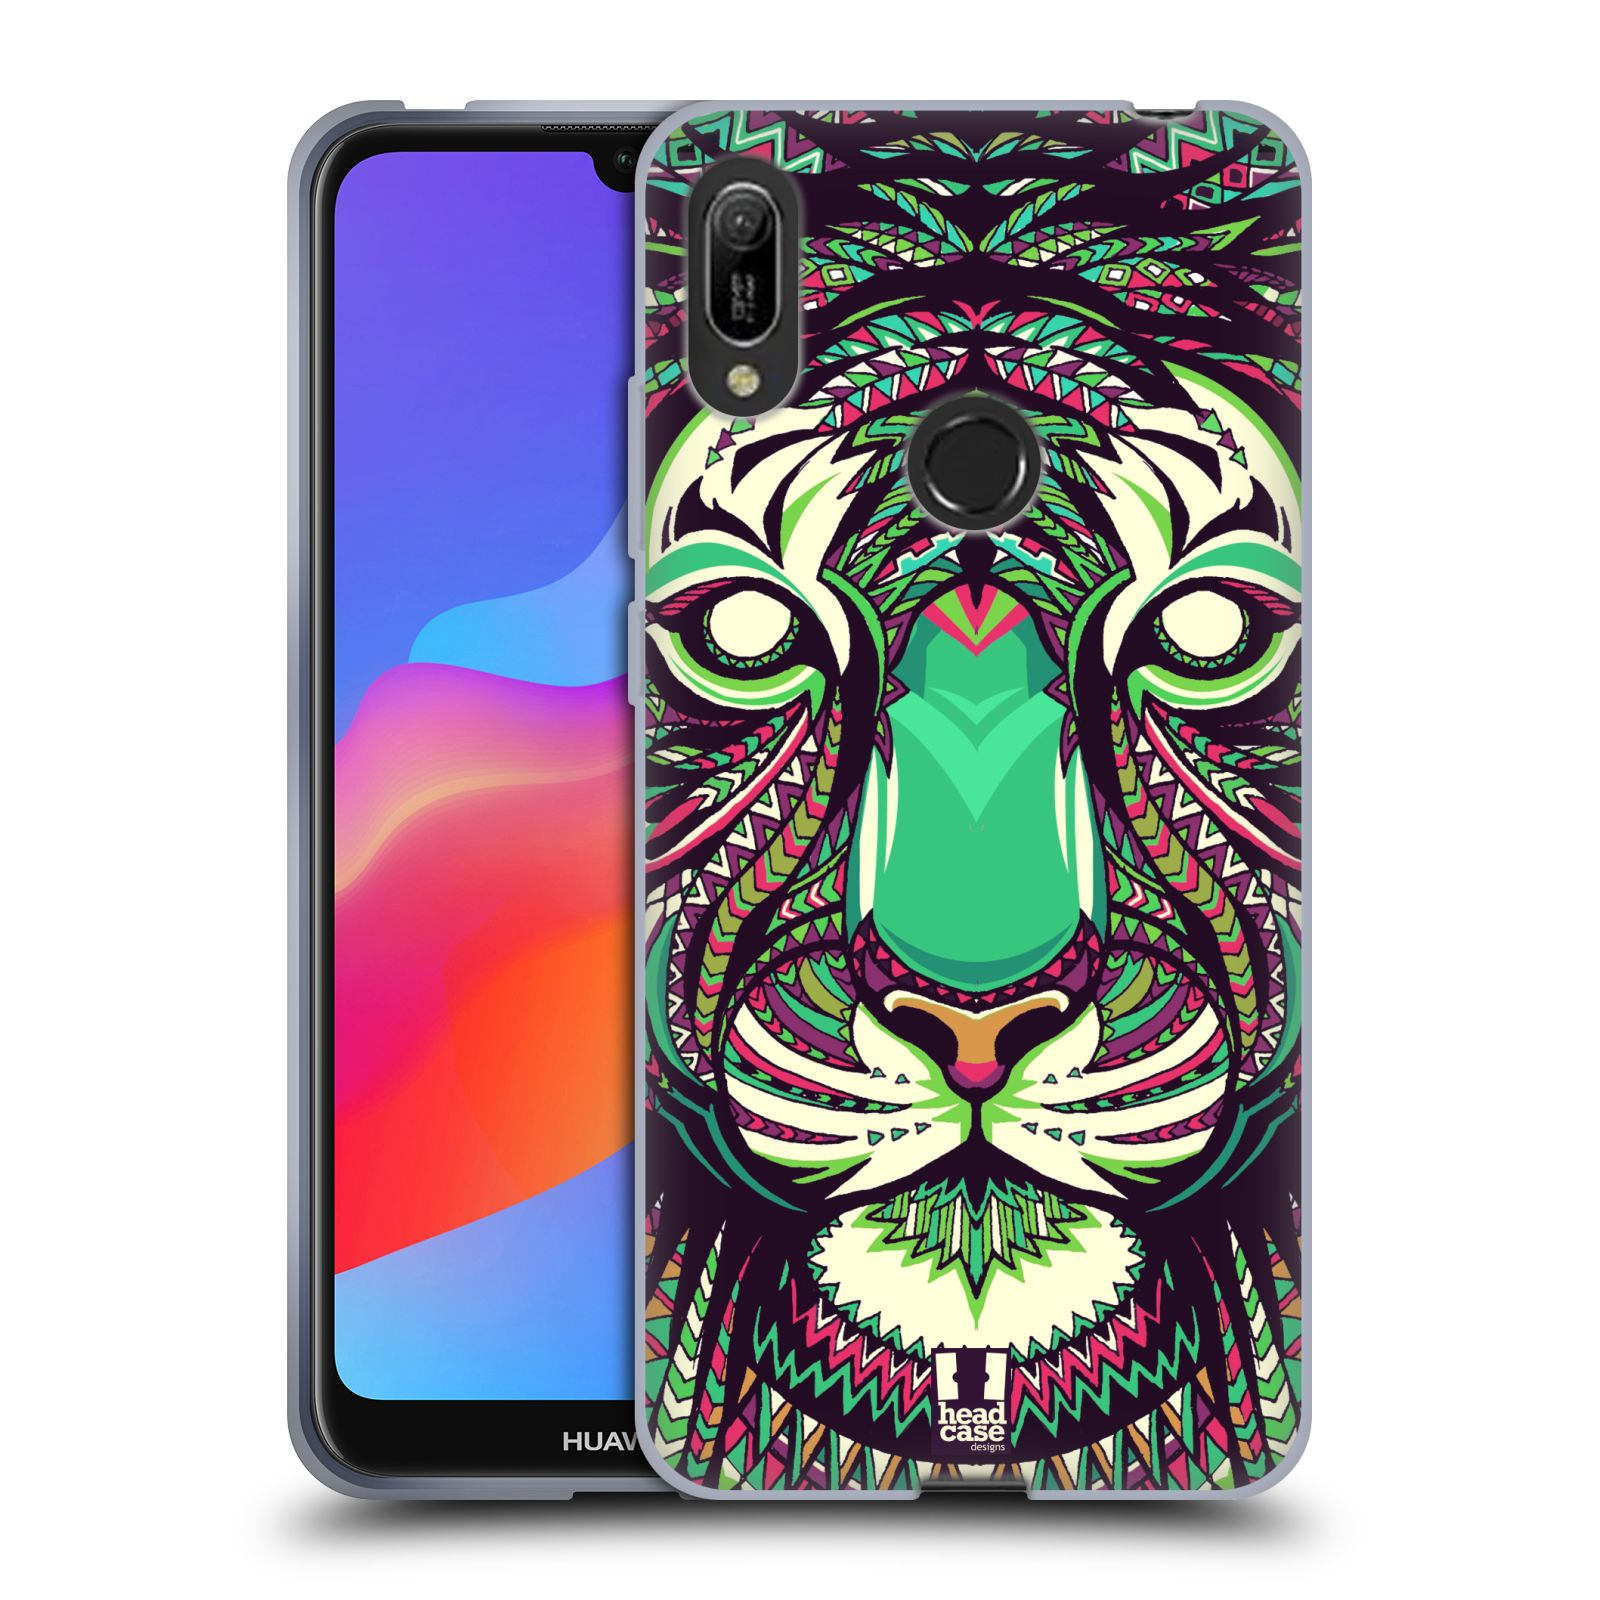 Silikonové pouzdro na mobil Huawei Y6 (2019) - Head Case - AZTEC TYGR